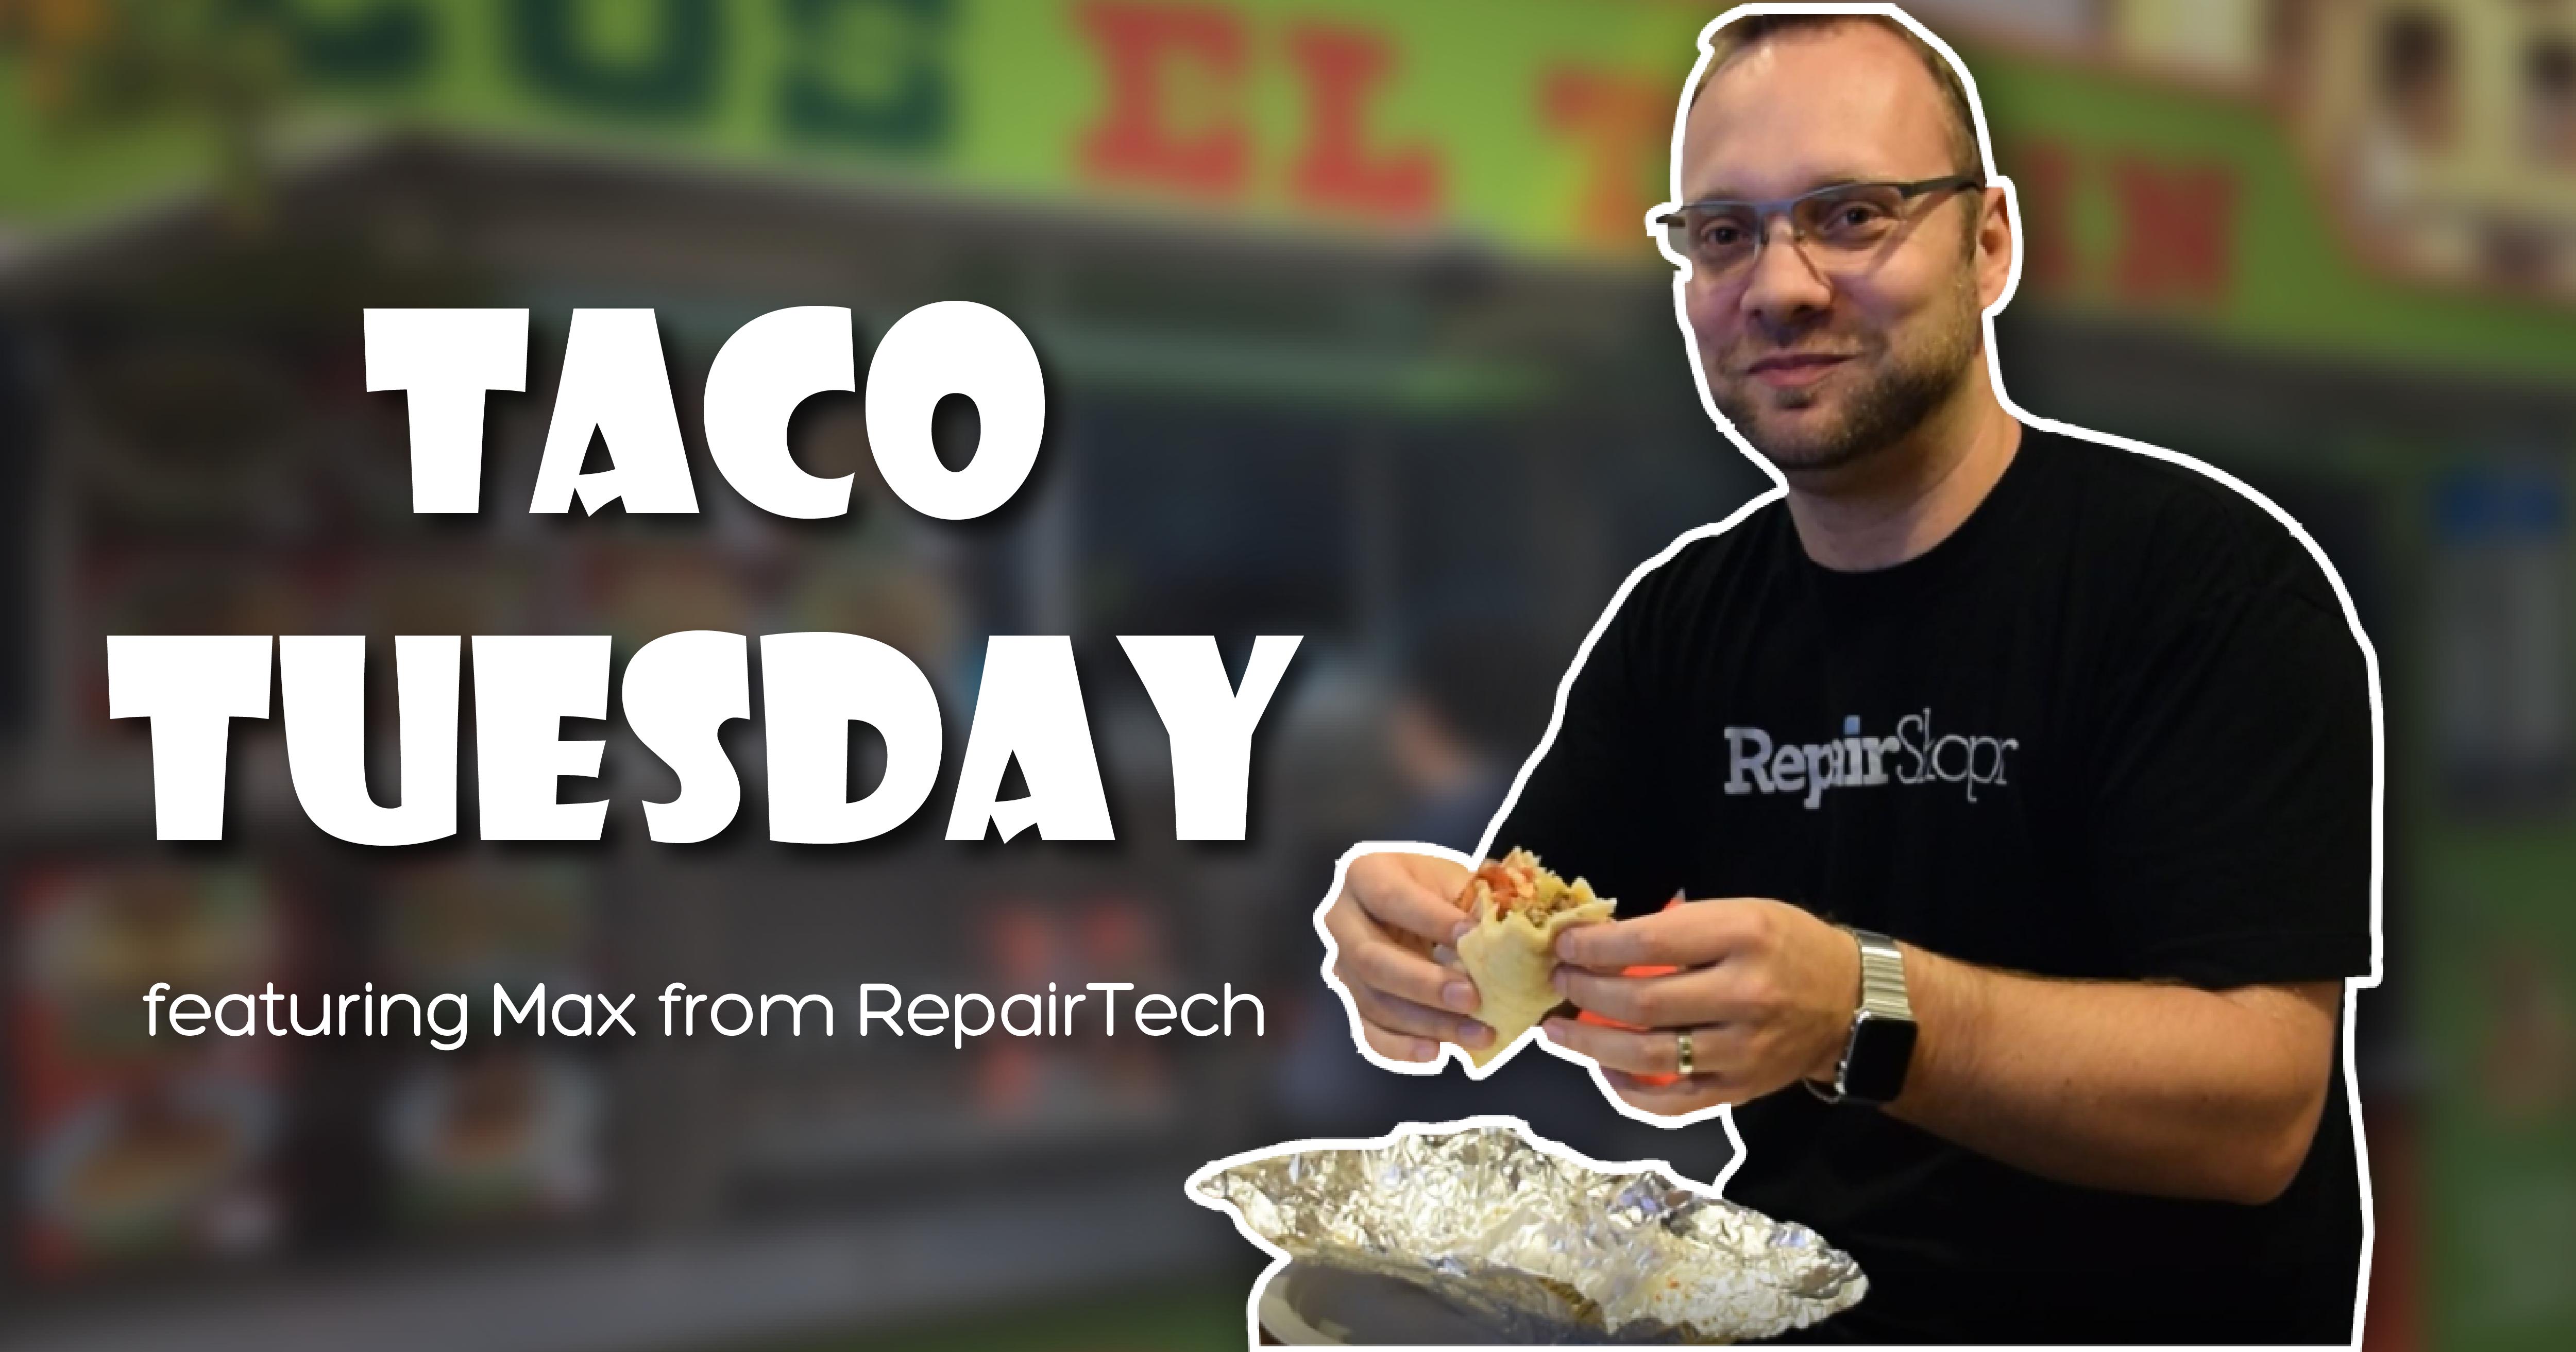 repairshopr taco tuesday